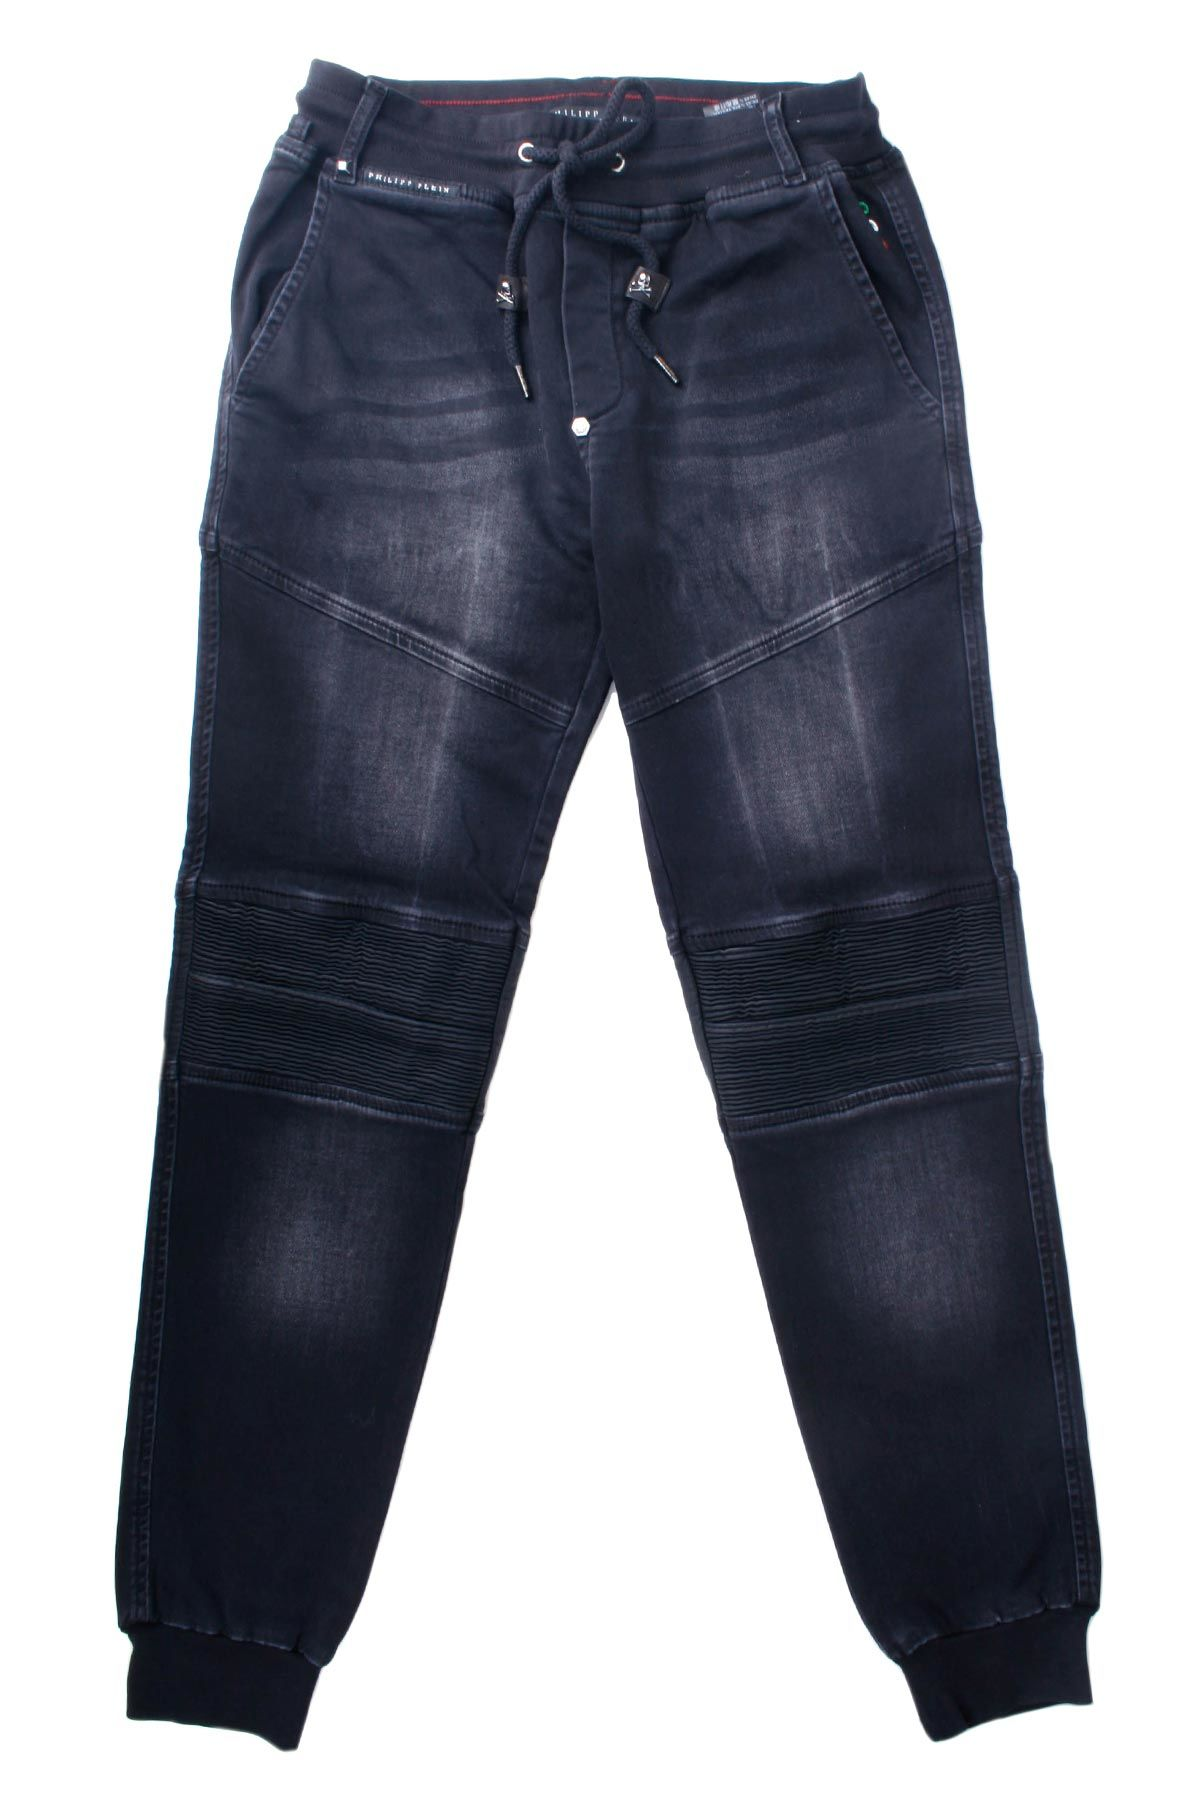 Philipp Plein Slim Shady Chill Fit Nets Black Jeans